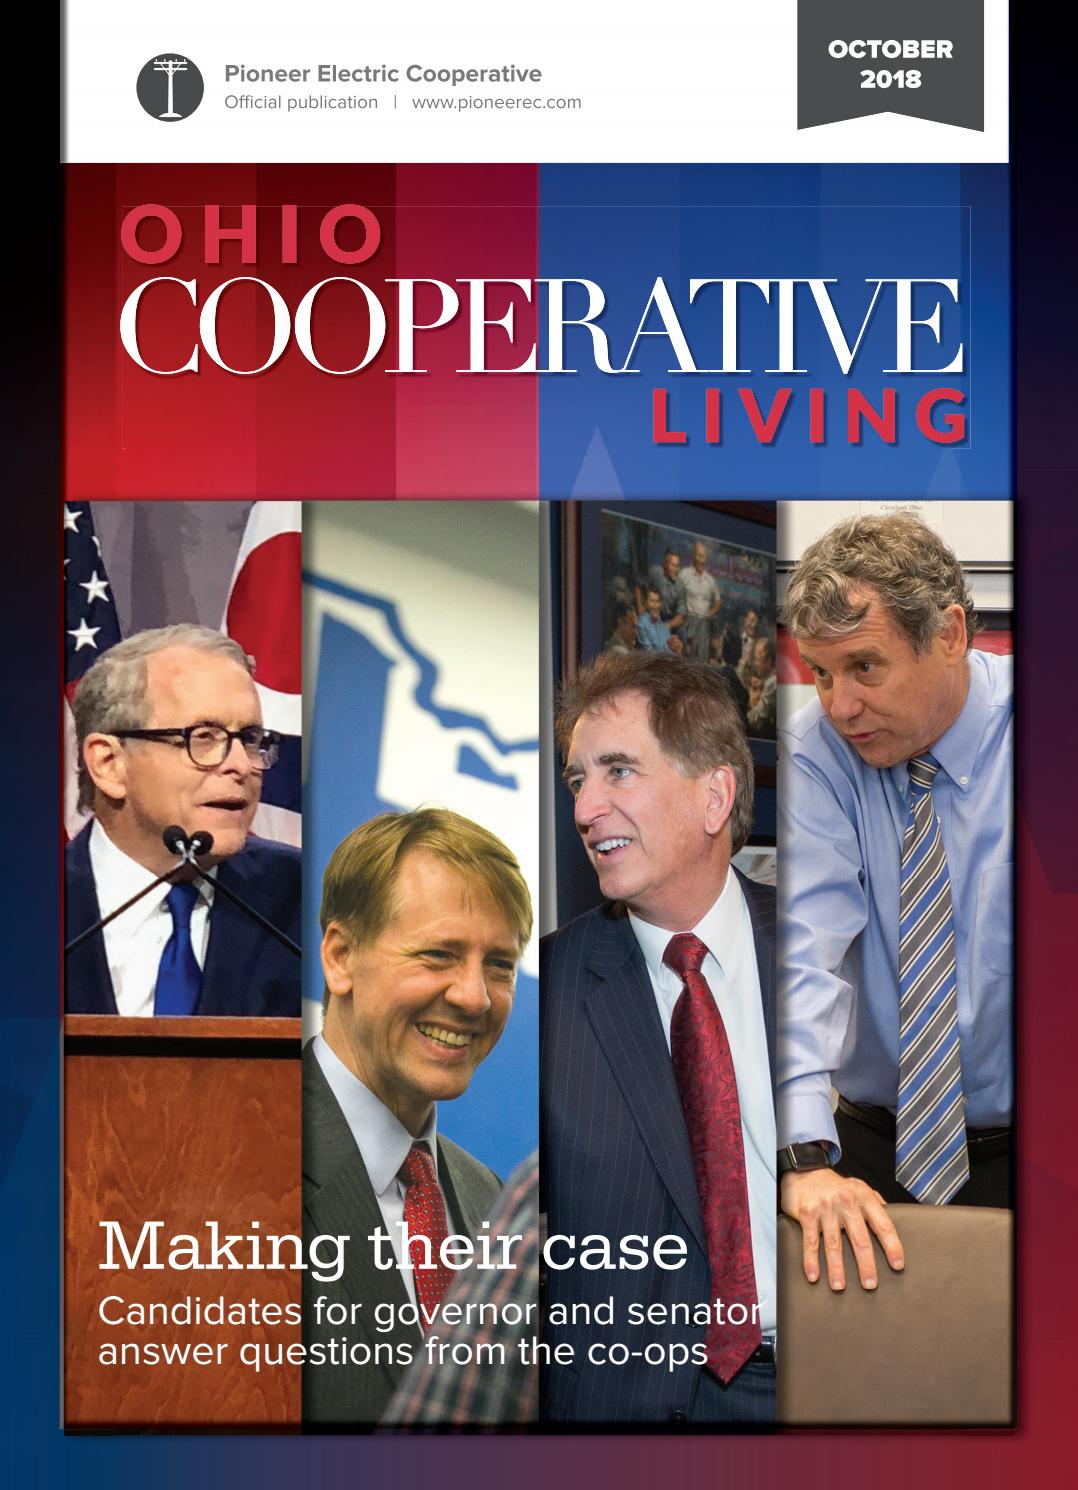 Ohio Cooperative Living - October 2018 - Pioneer